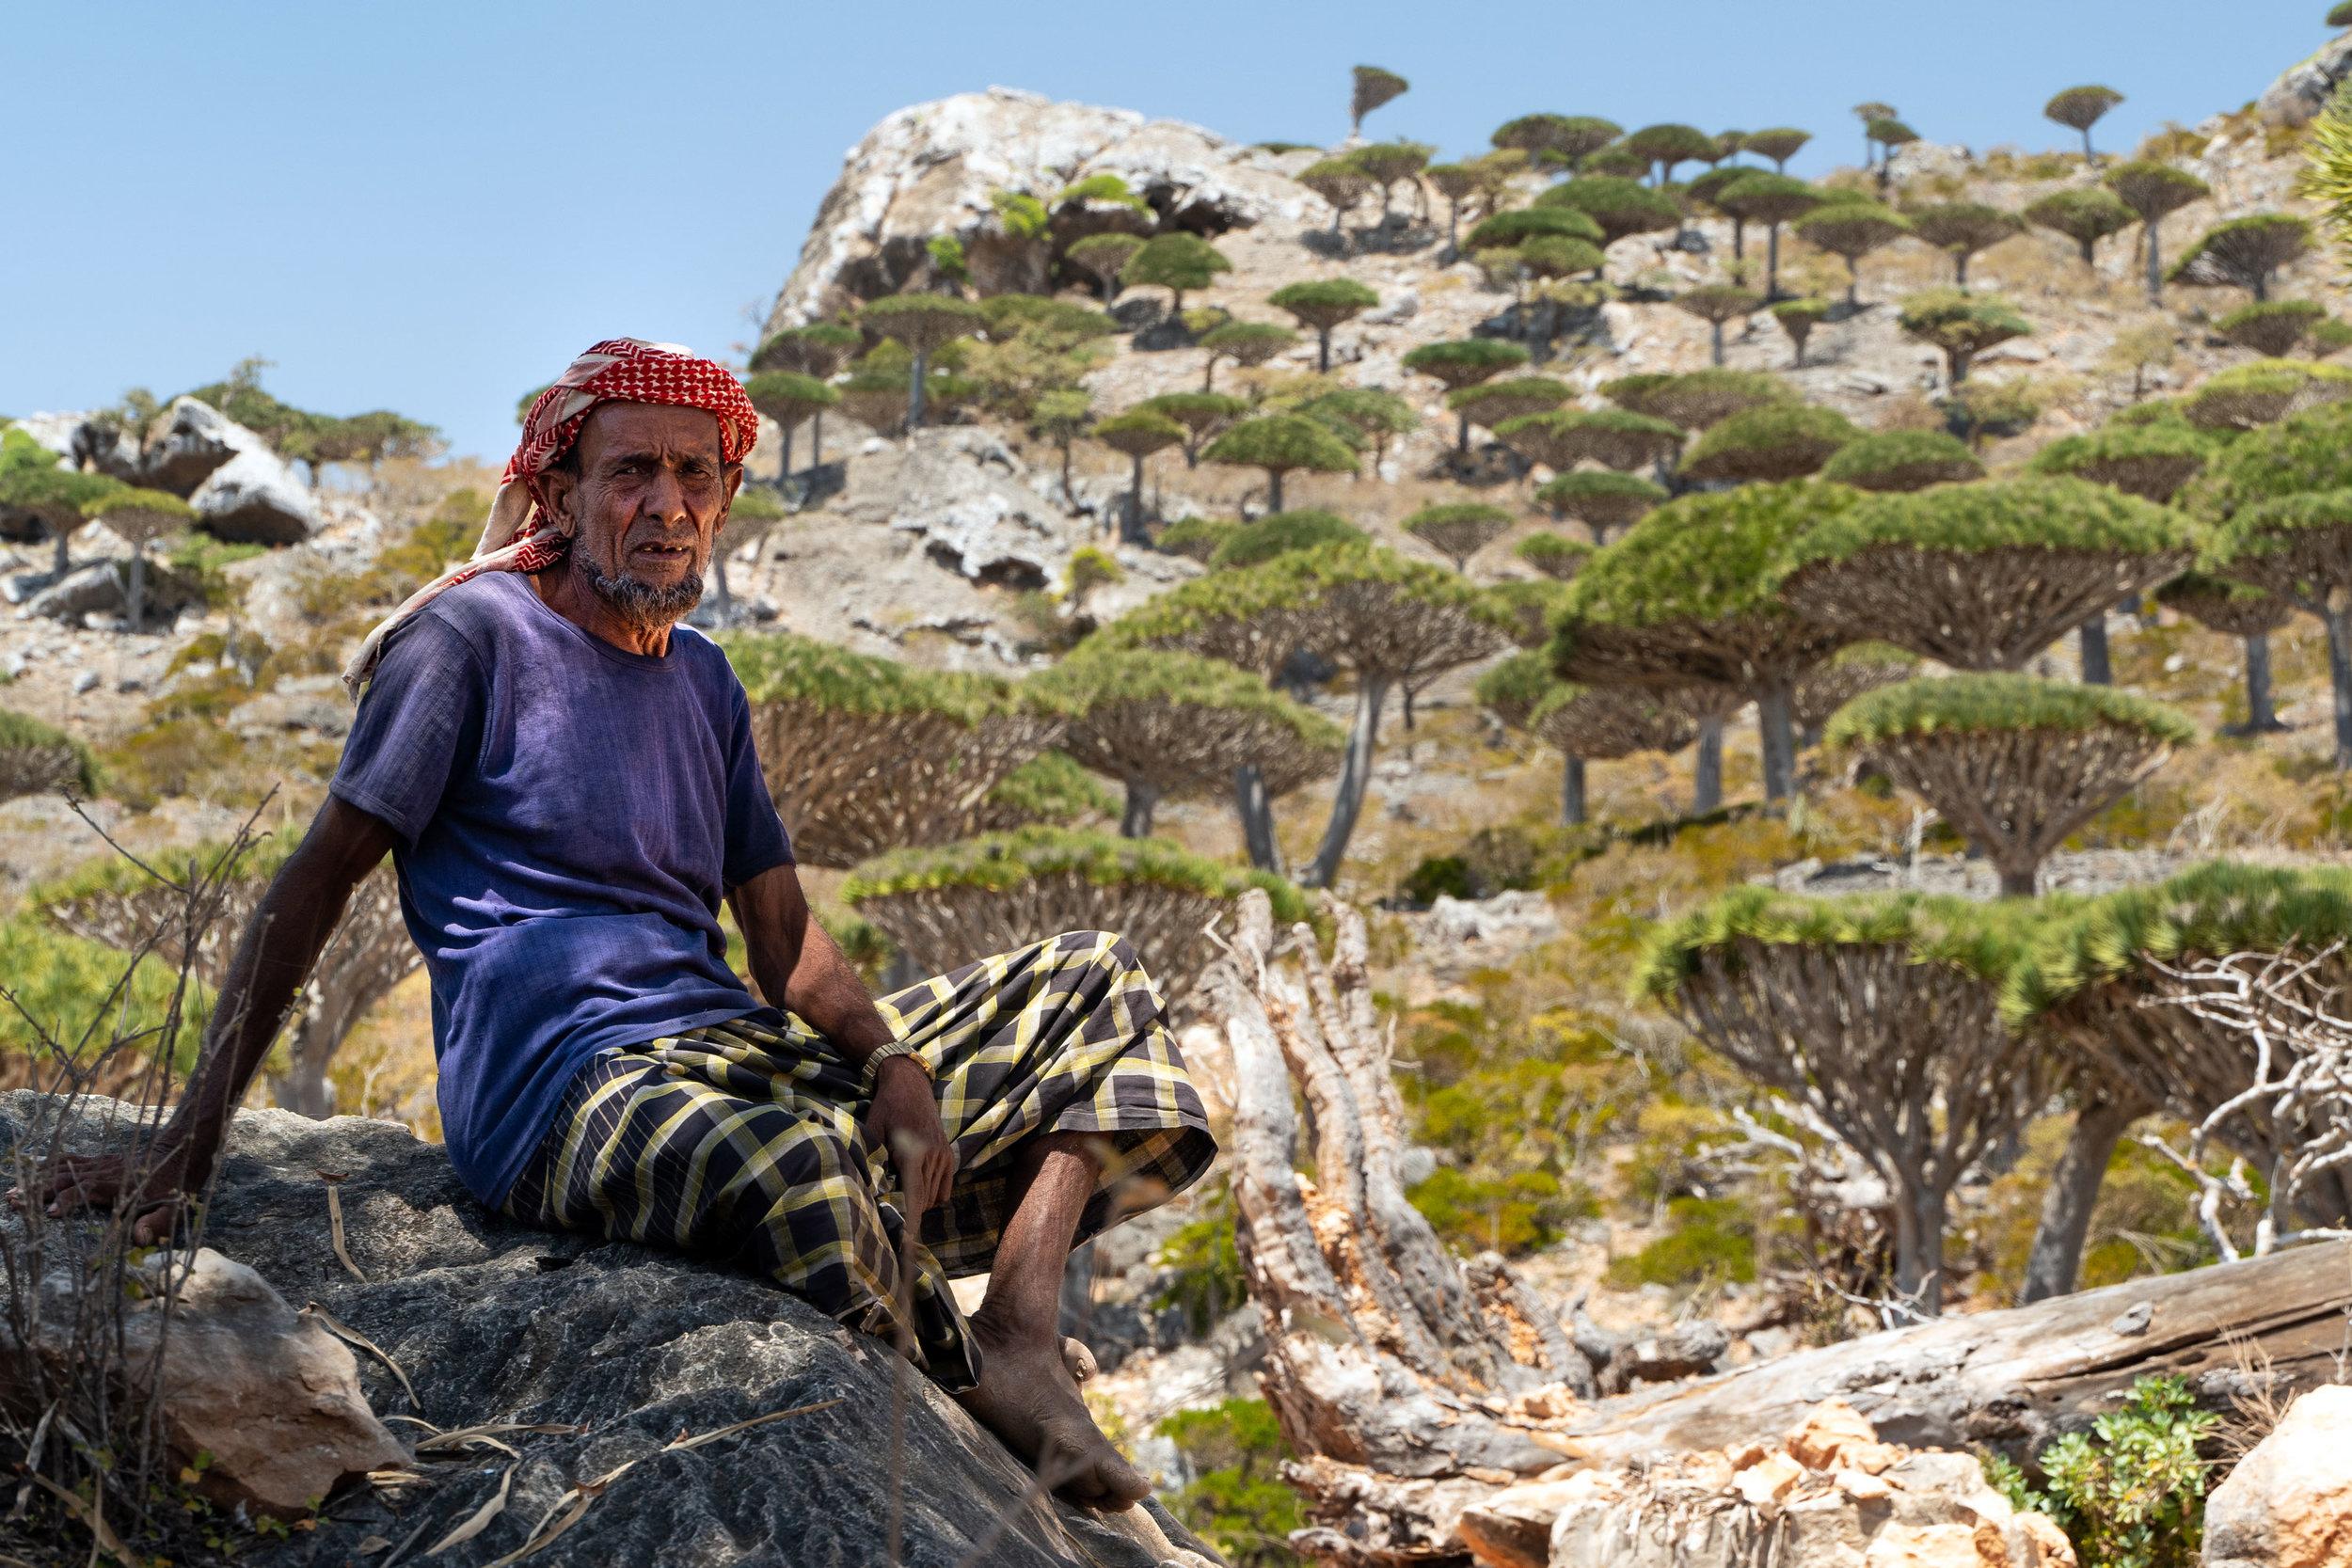 socotri-bedouin-nur-in-the-fermhin-forest-of-diksam-souther-socotra-yemen-yemeni-inertia-network.jpg